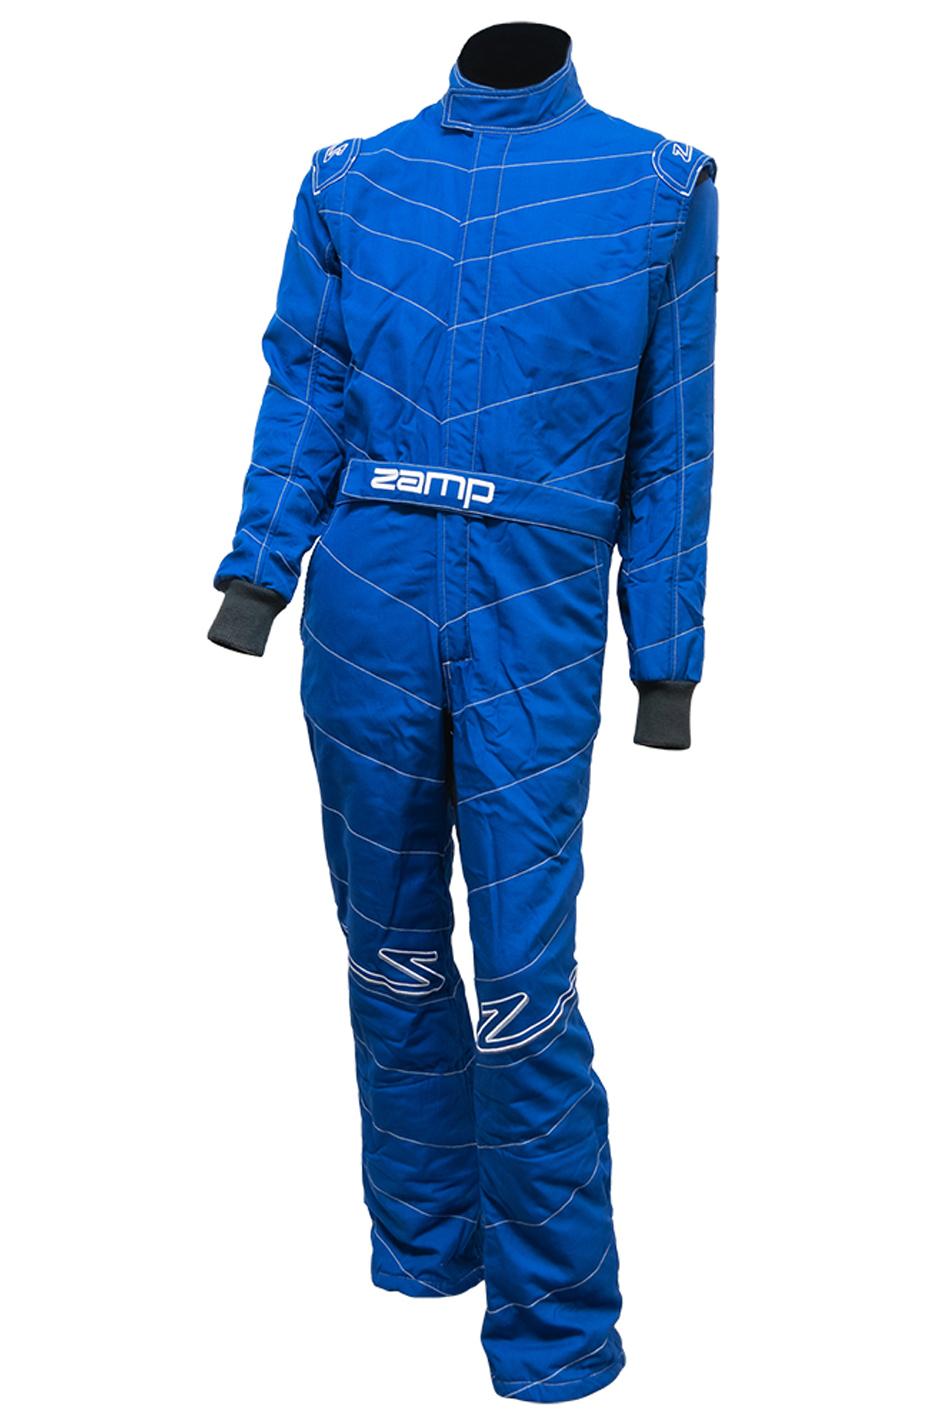 Zamp R040004S Suit, ZR-50, 1 Piece, SFI 3.2A/5, Triple Layer, Fire Retardant Fabric, Blue, Small, Each